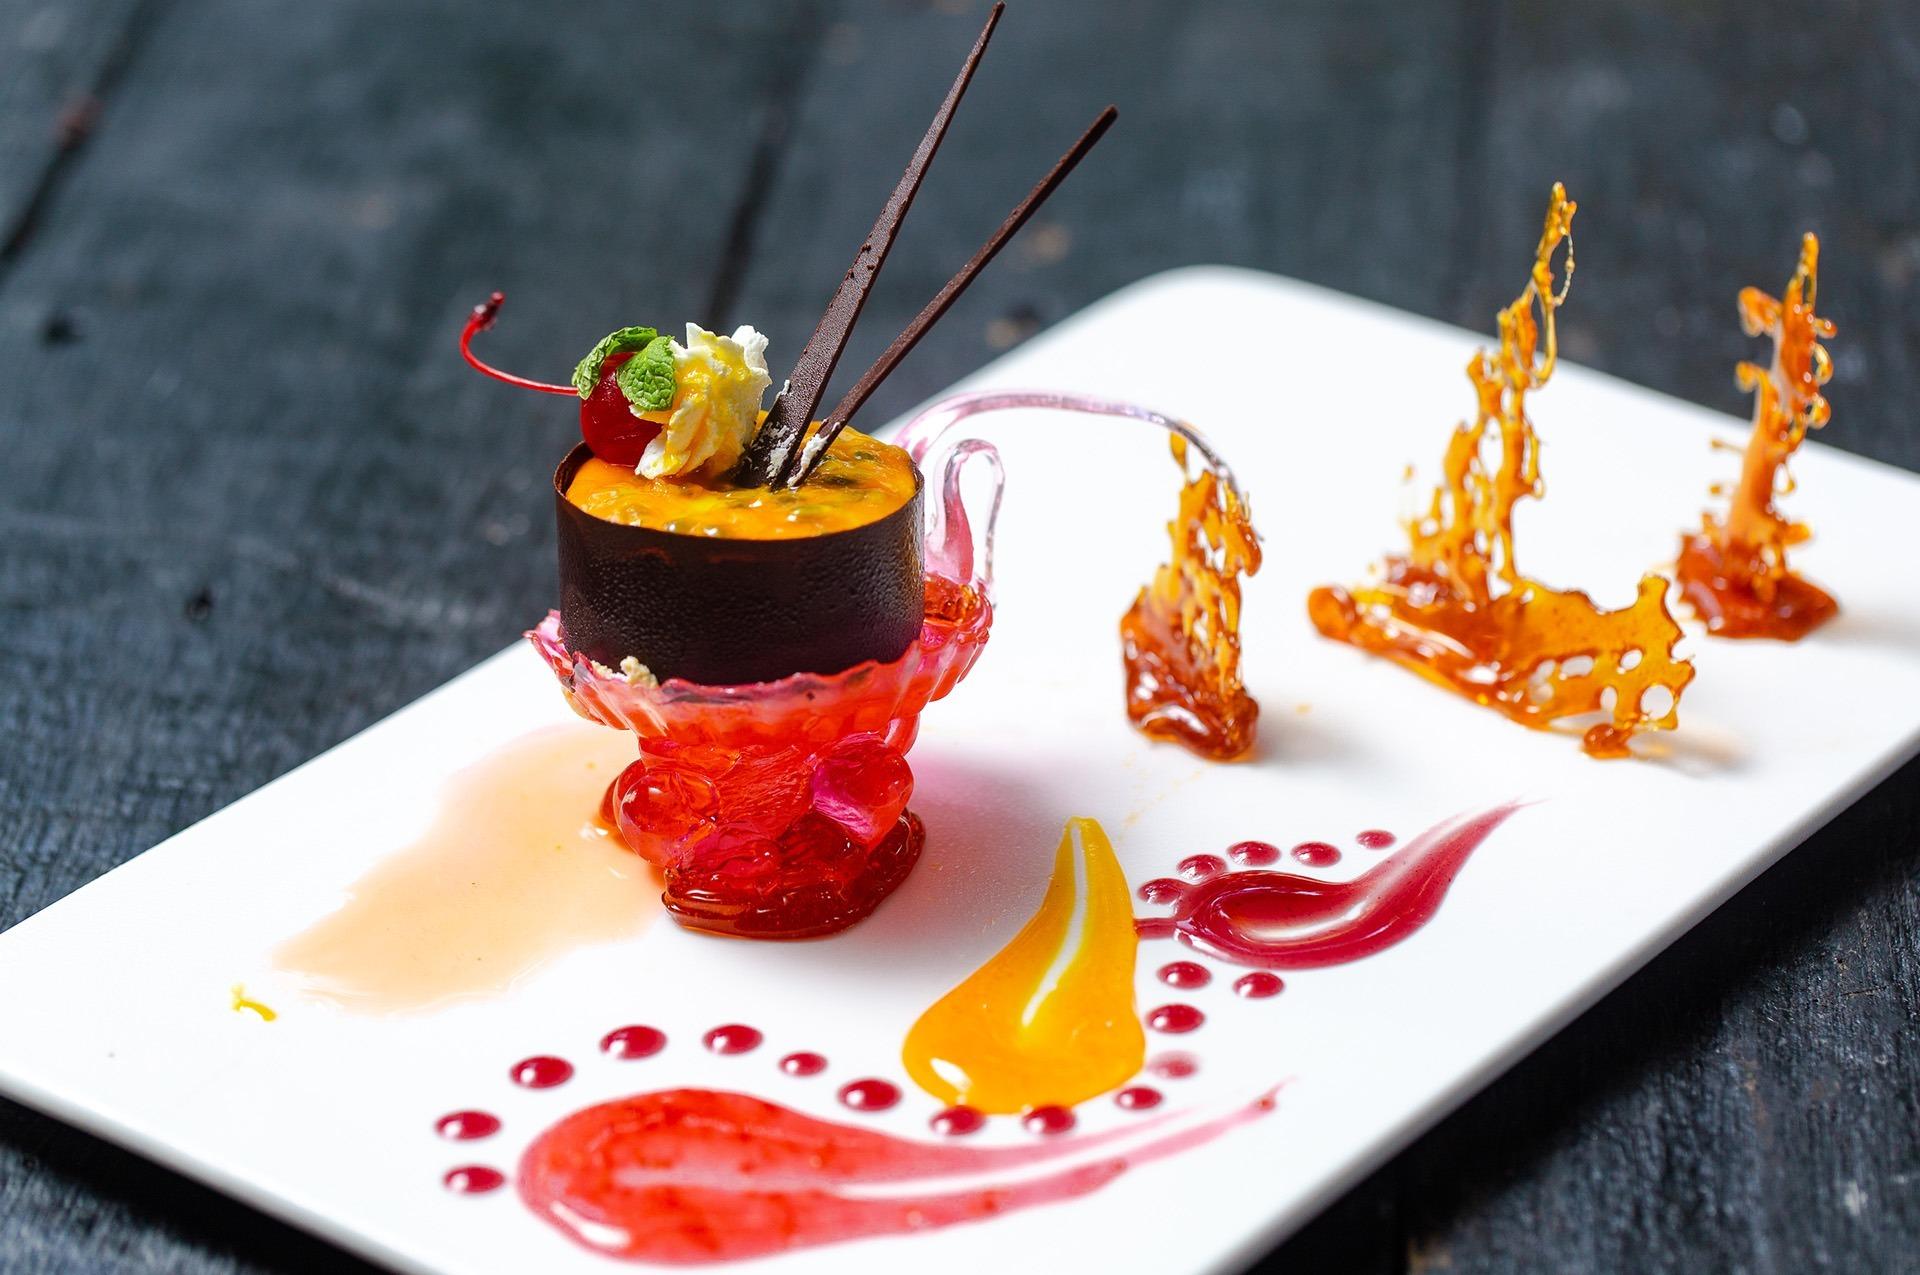 Embudu-Village-Food-Desserts